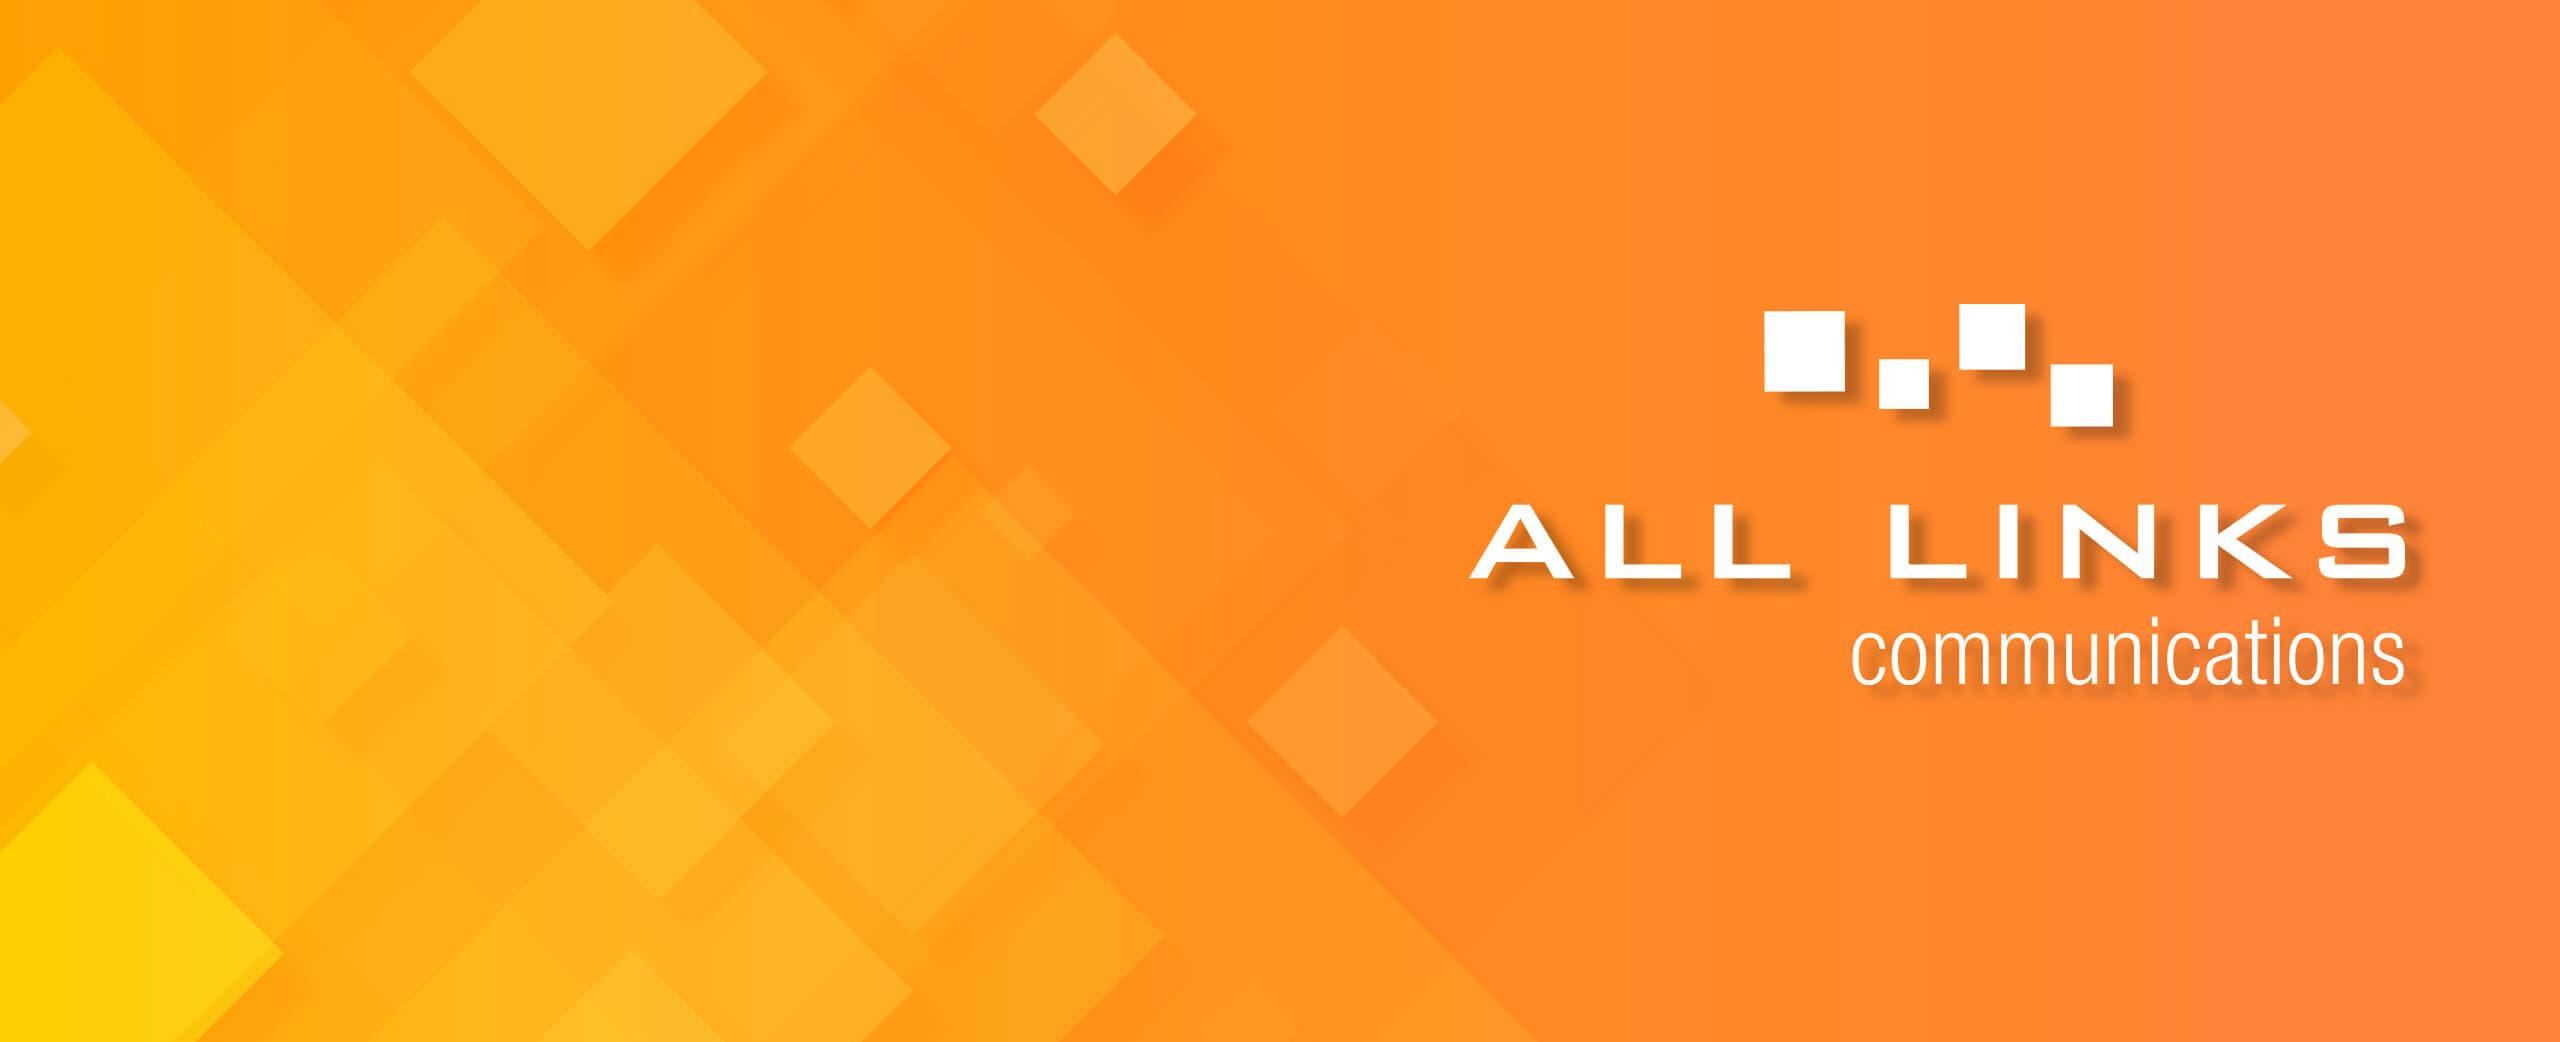 dmg-logos-all-links-communication